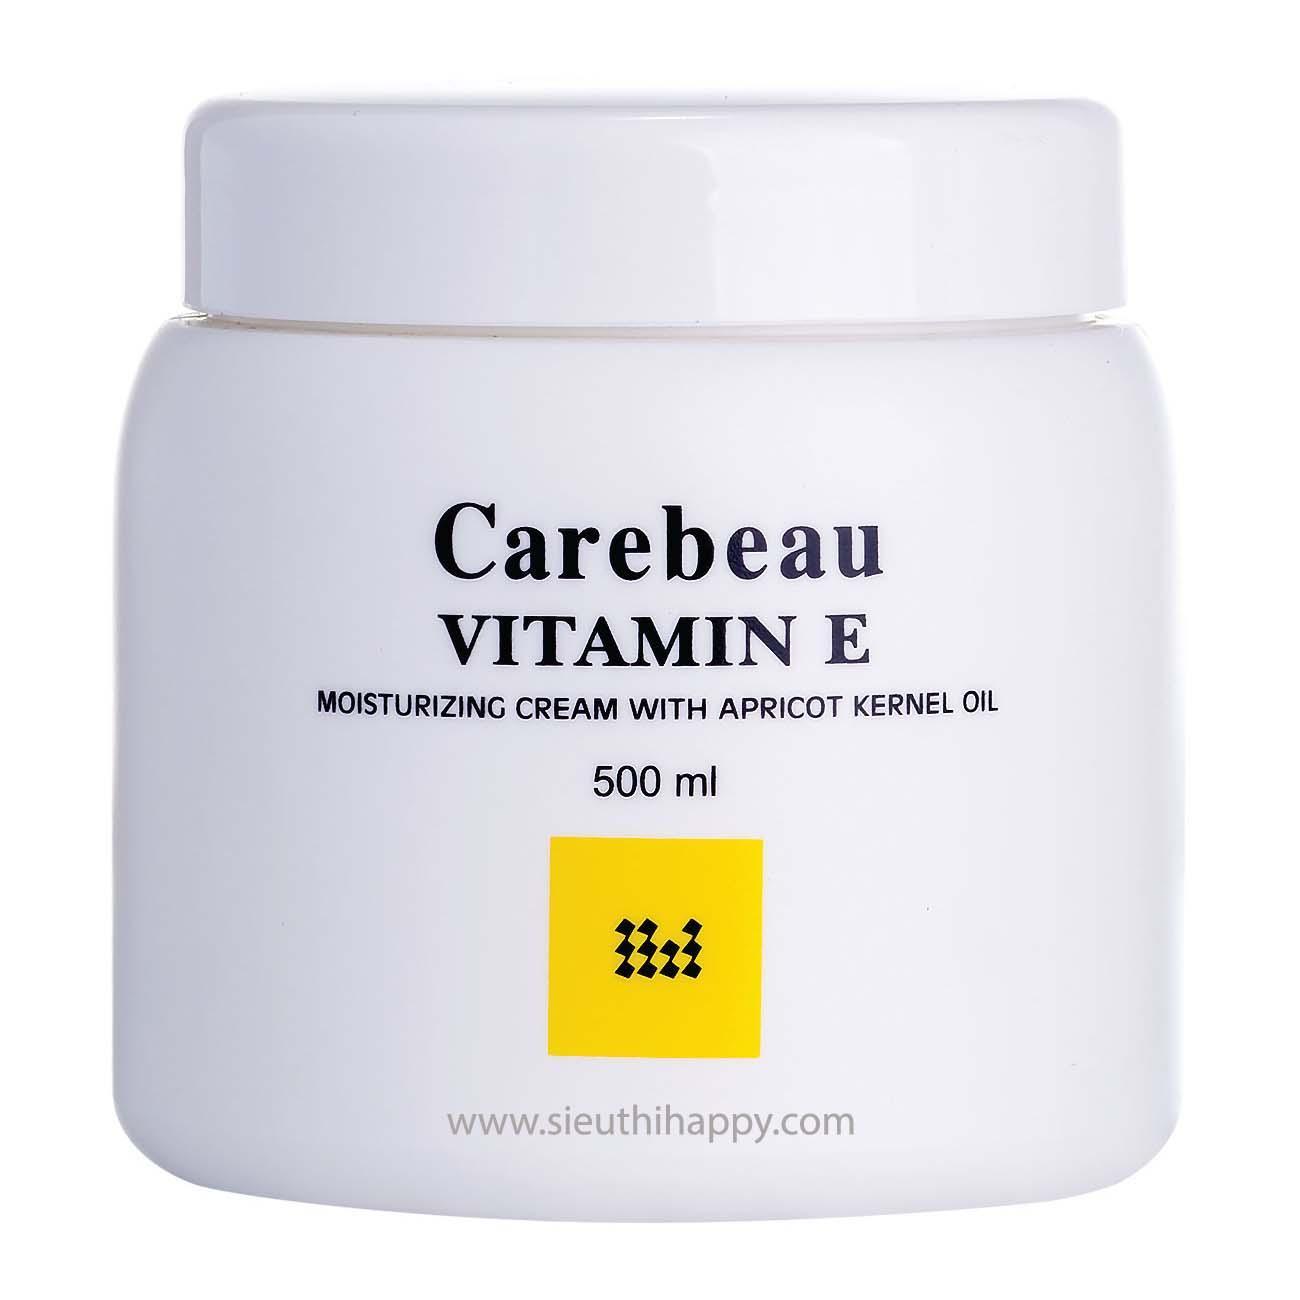 Kem dưỡng da toàn thân Carebeau Body Cream Viatmin E  500ml Thái Lan